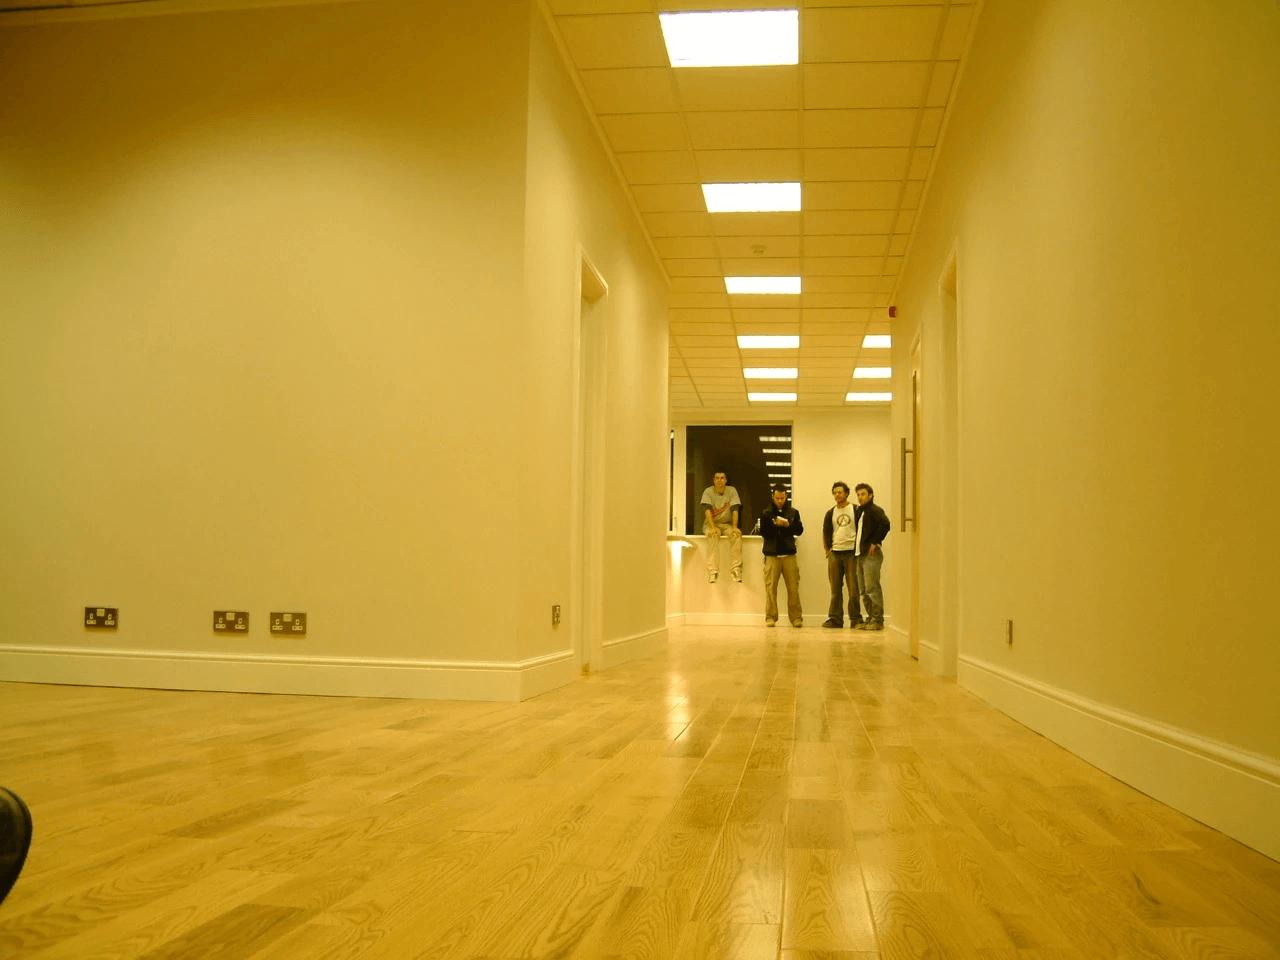 Corridor with People | Silverfox Design & Build